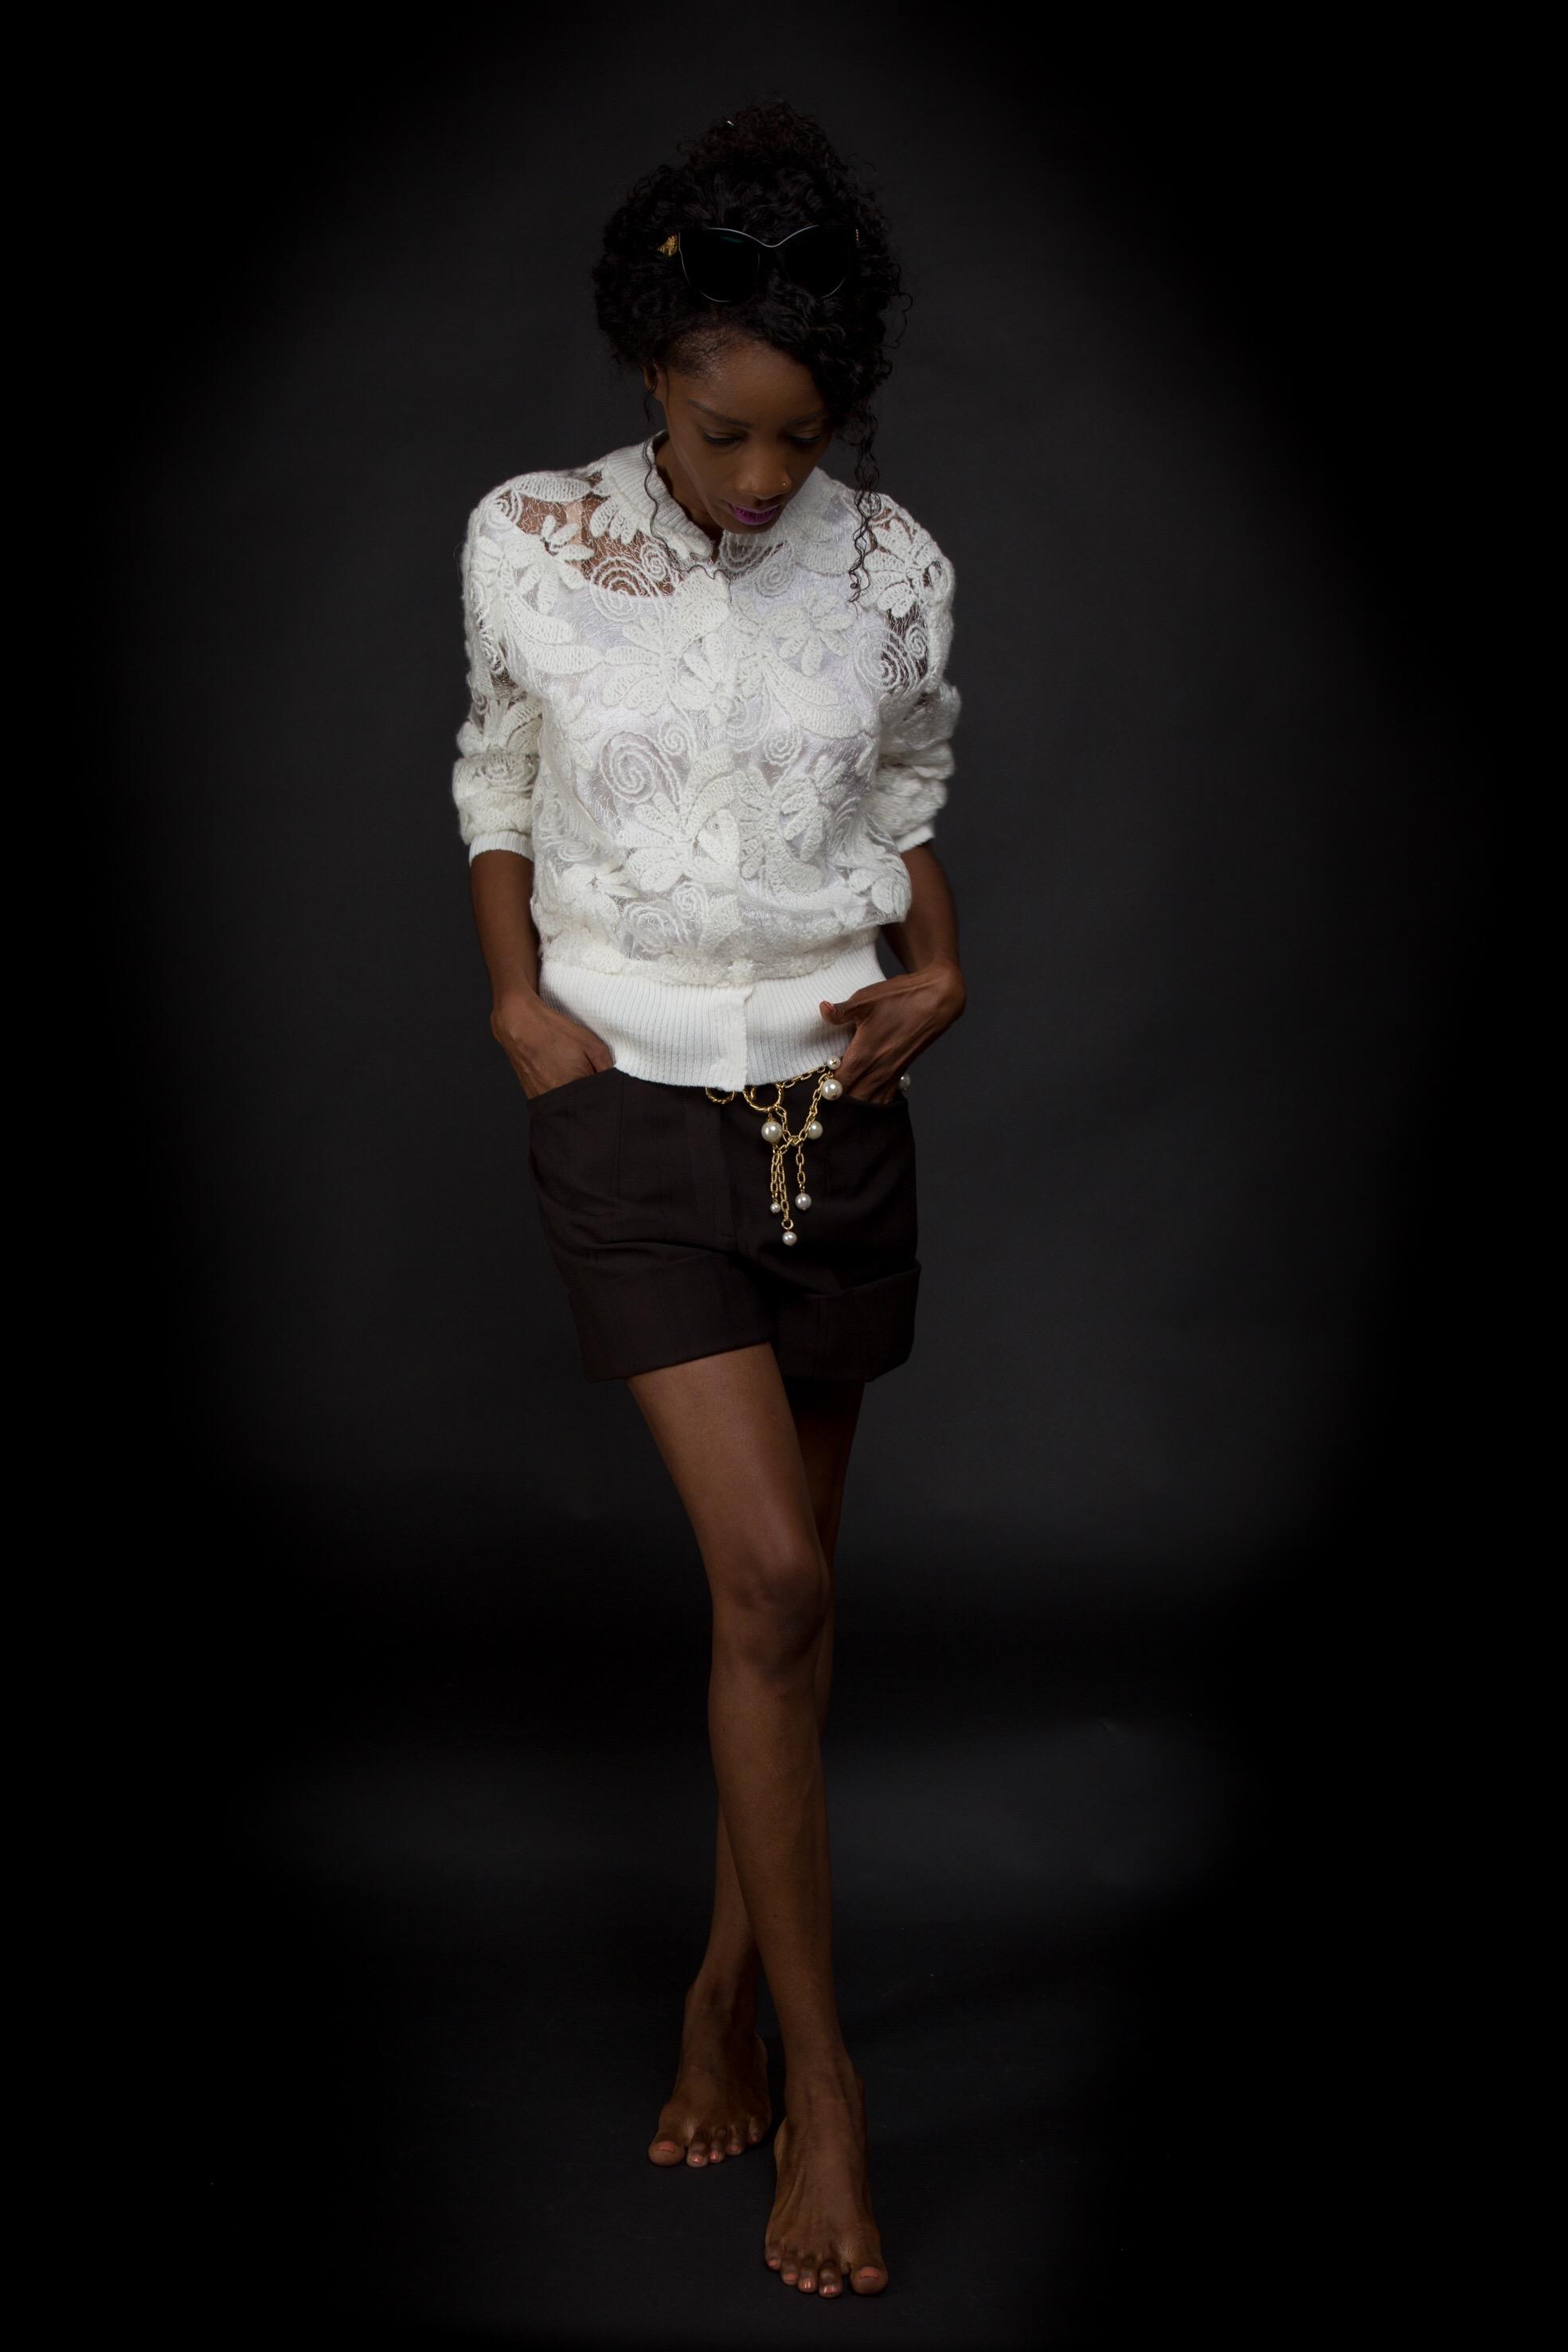 haute couture Margret Gasper collection